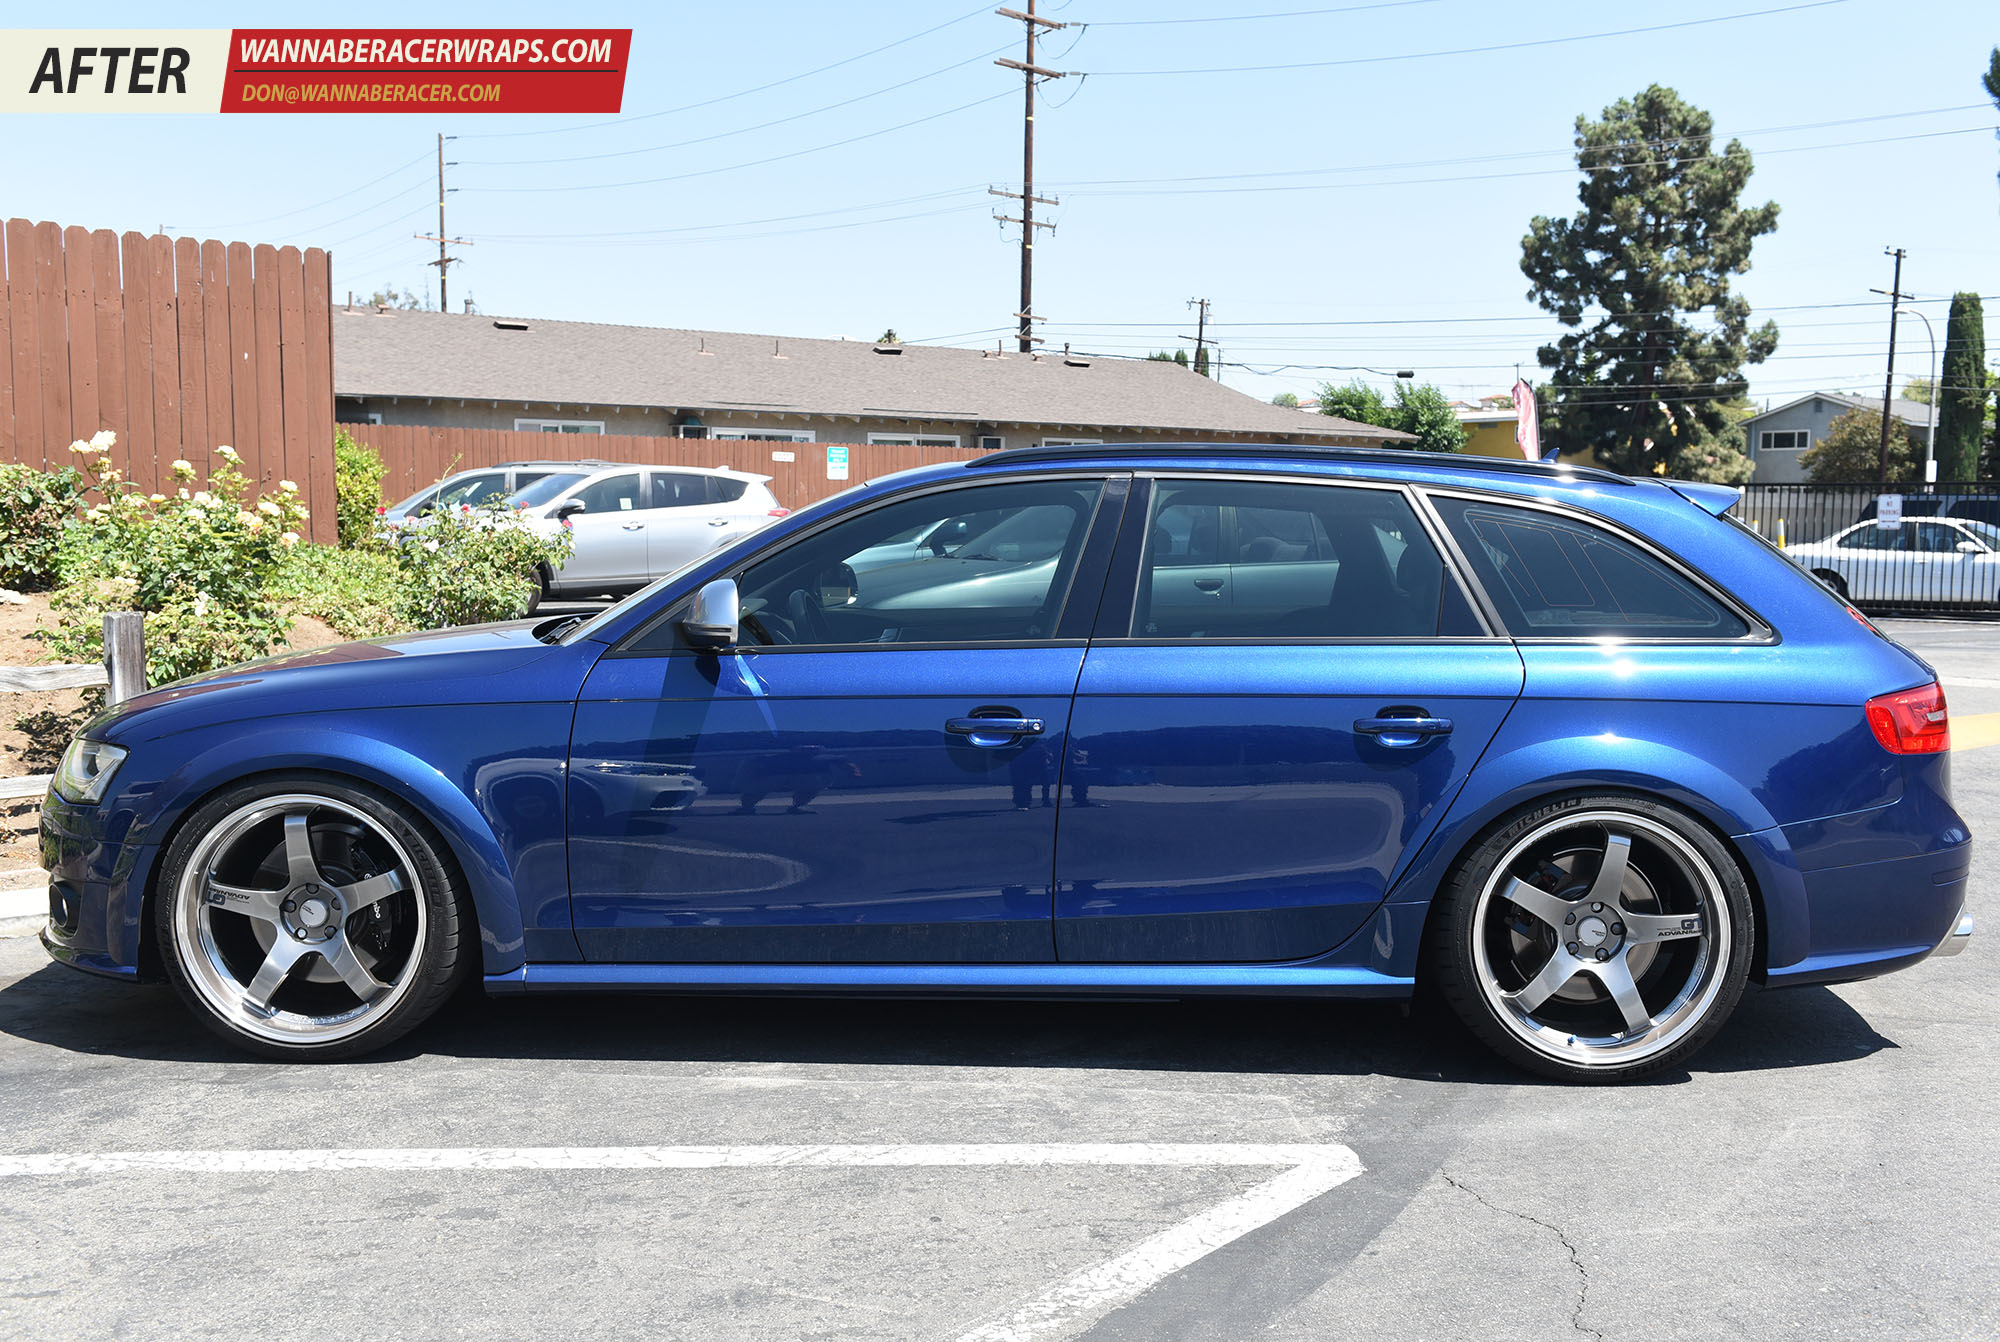 Audi A6 Allroad Wagon - Gloss Black Window Trim and Roof Rails Vinyl Car Wrap